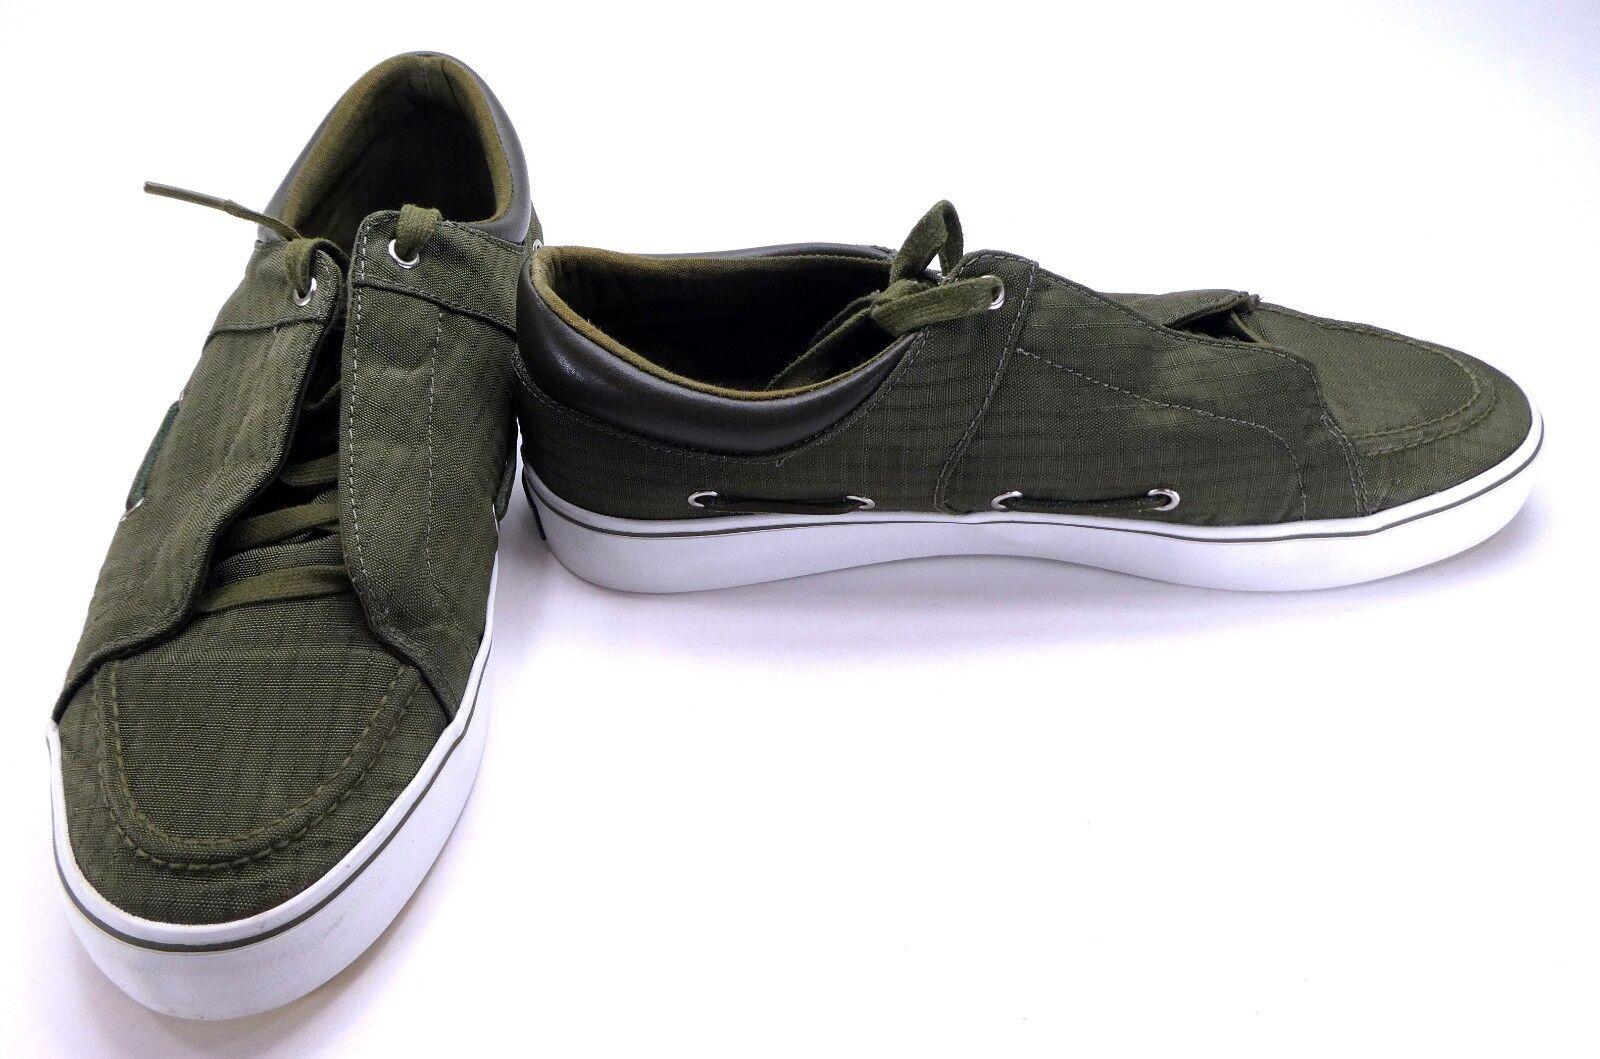 Creative Recreation Boat Shoes Luchese Ripstop Miliary/Yellow Topsiders Size 11 Scarpe classiche da uomo